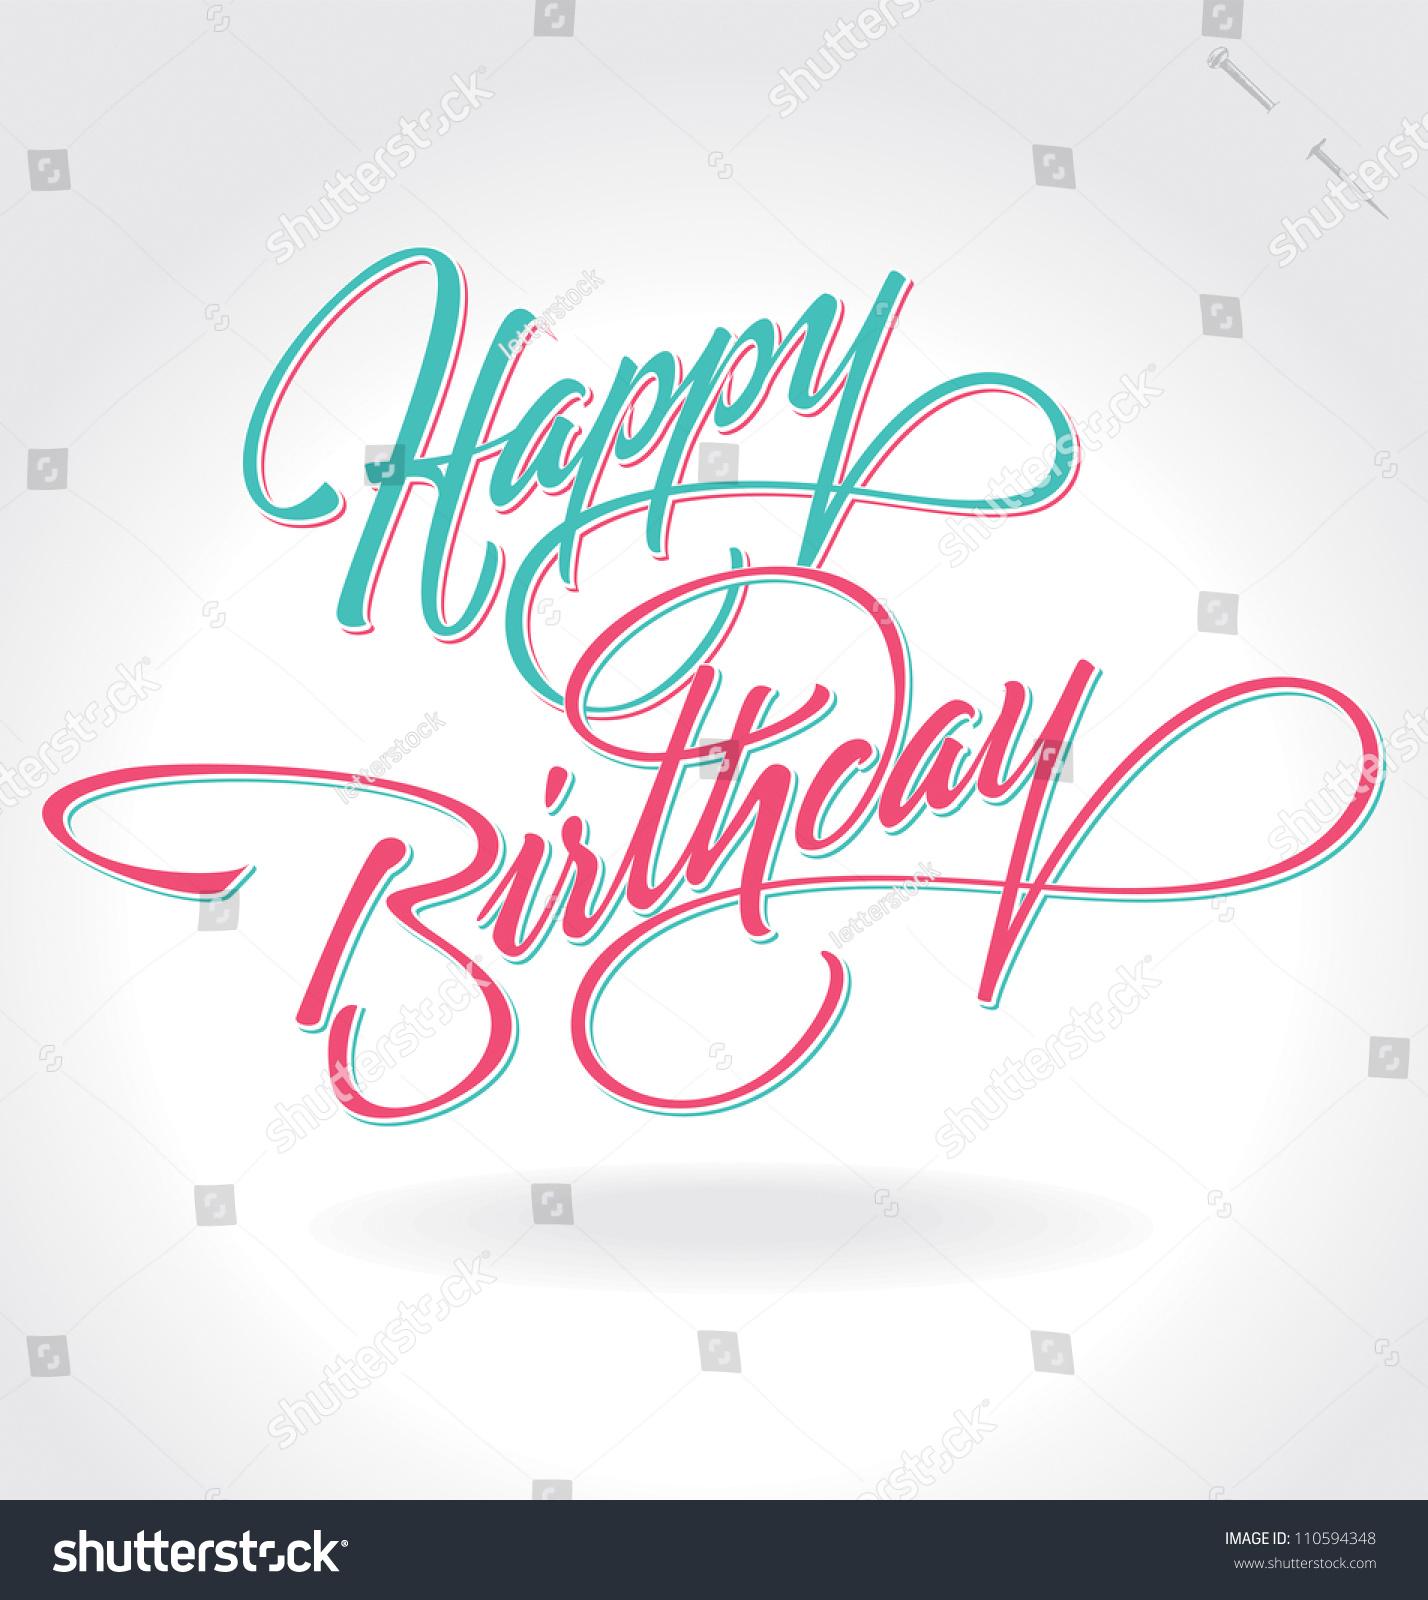 Happy Birthday Writing In Cursive